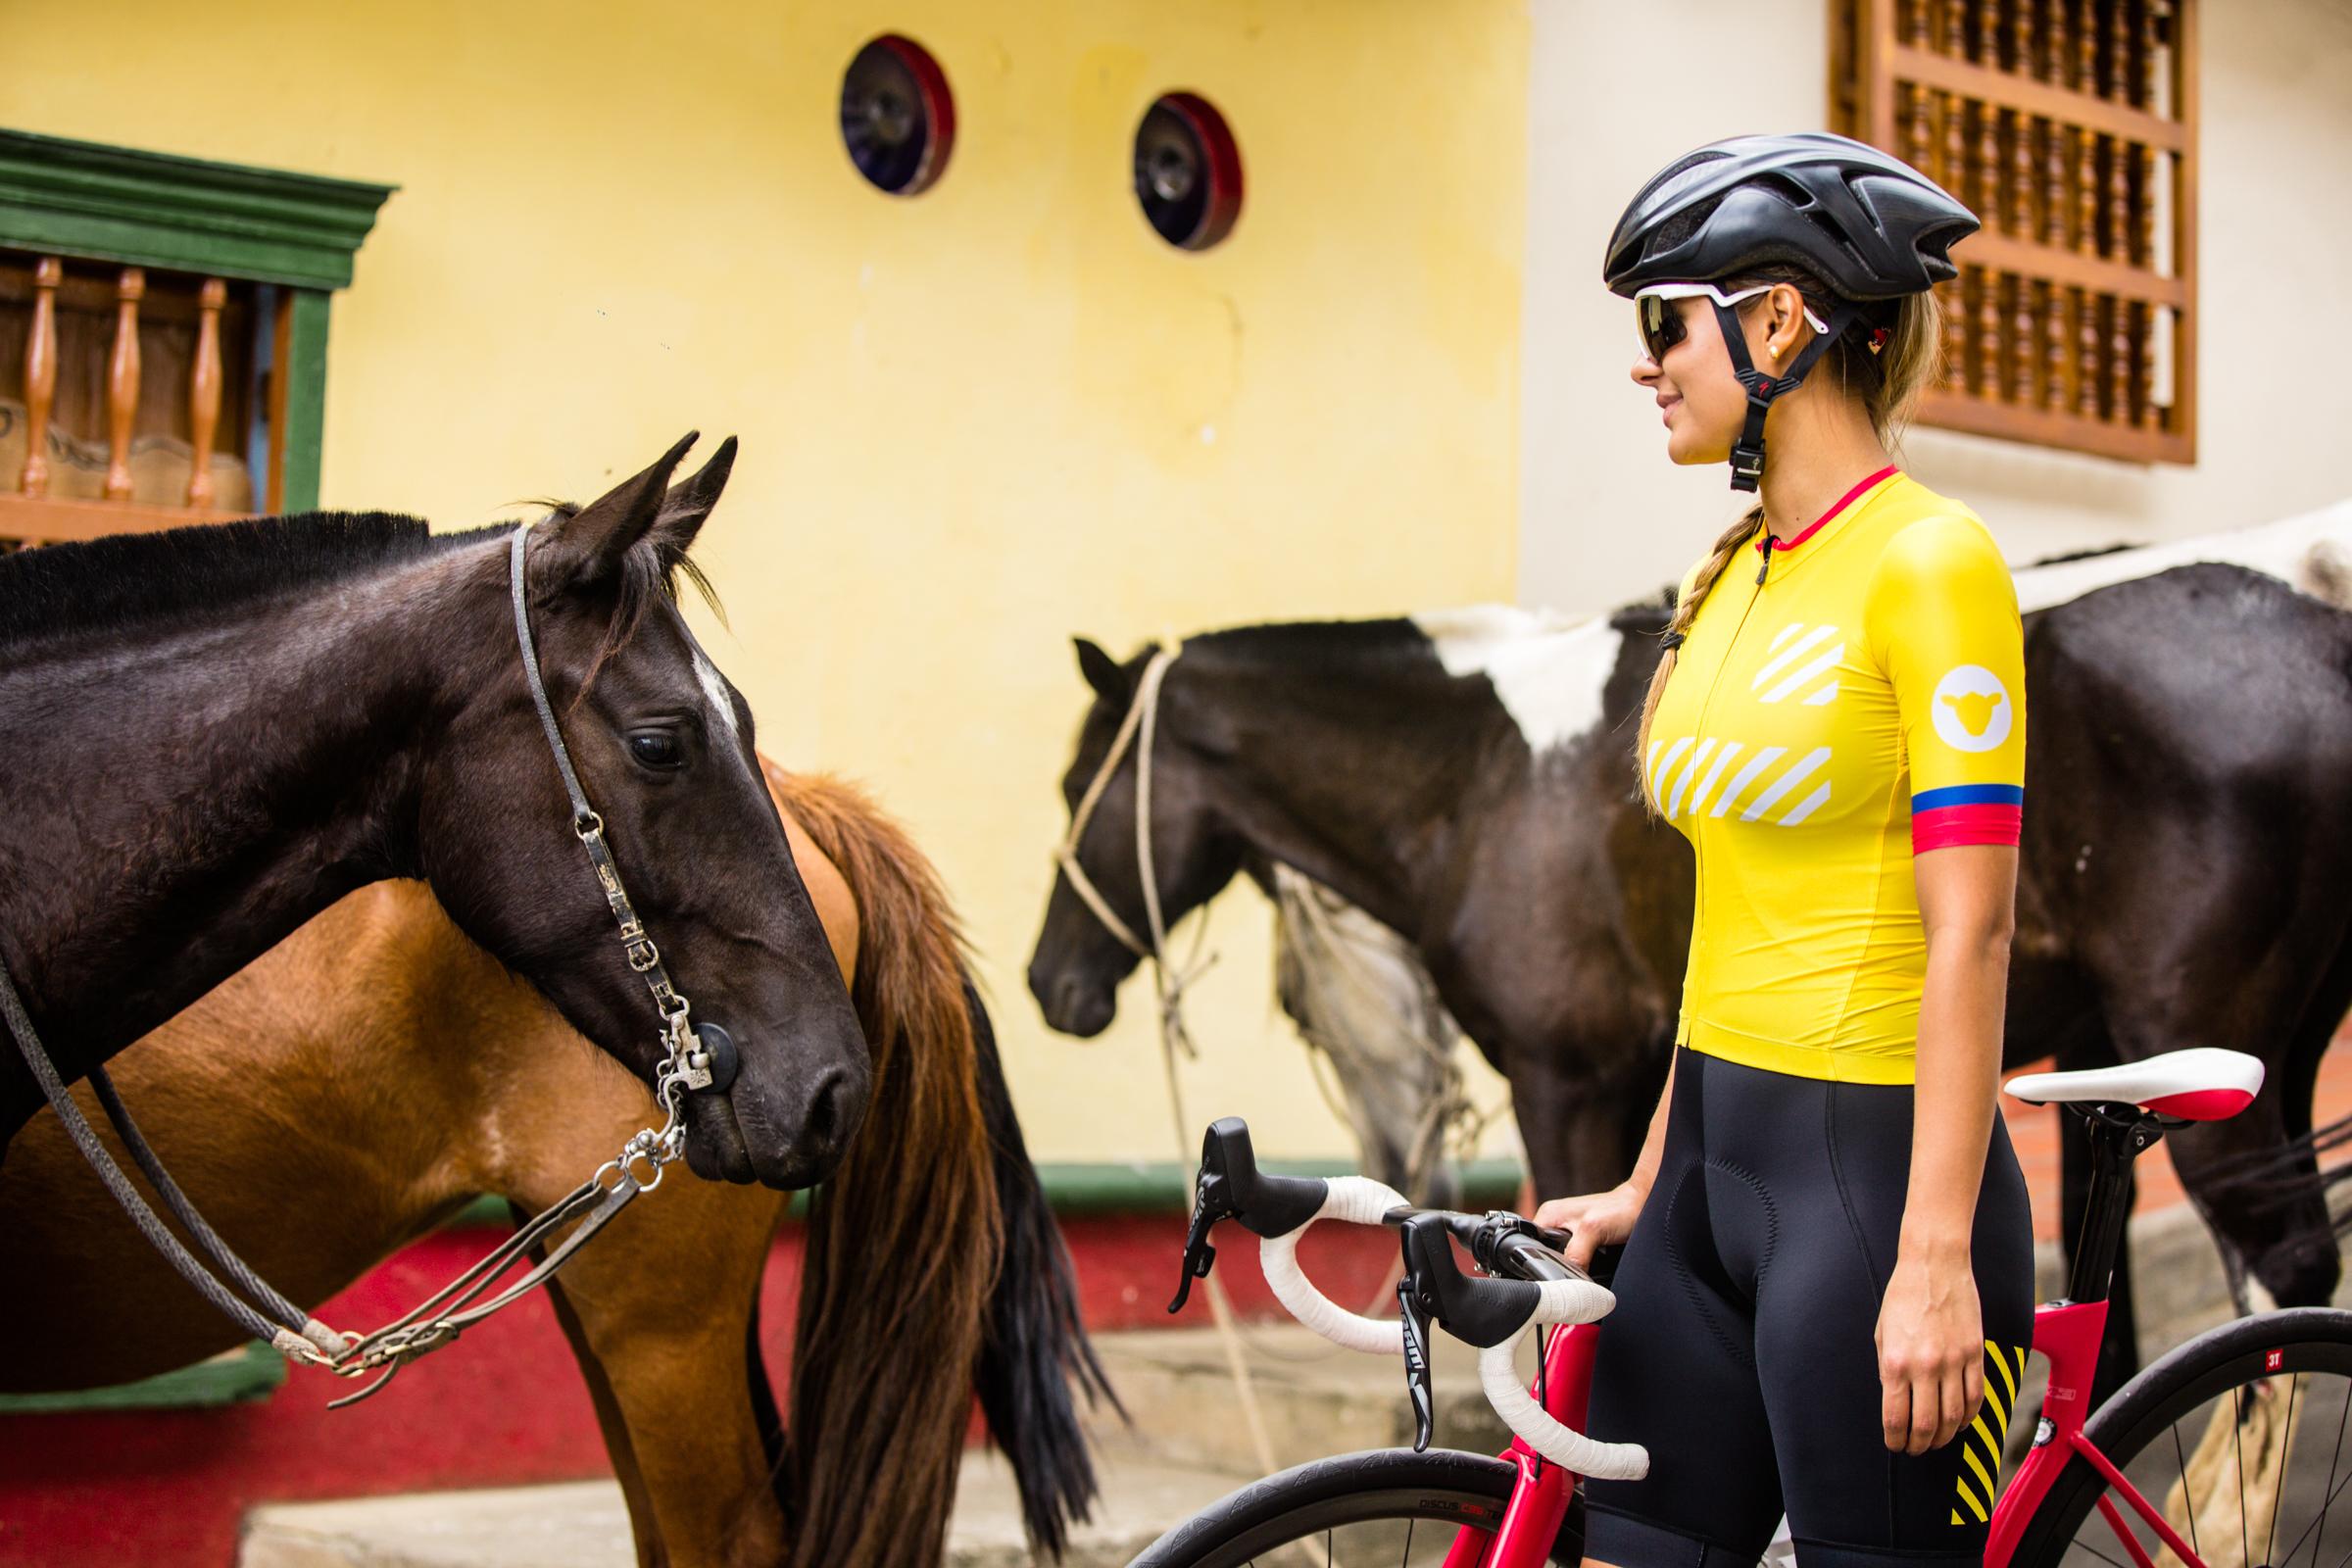 f12b059ece8 LOS CAFETEROS. by Black Sheep Cycling